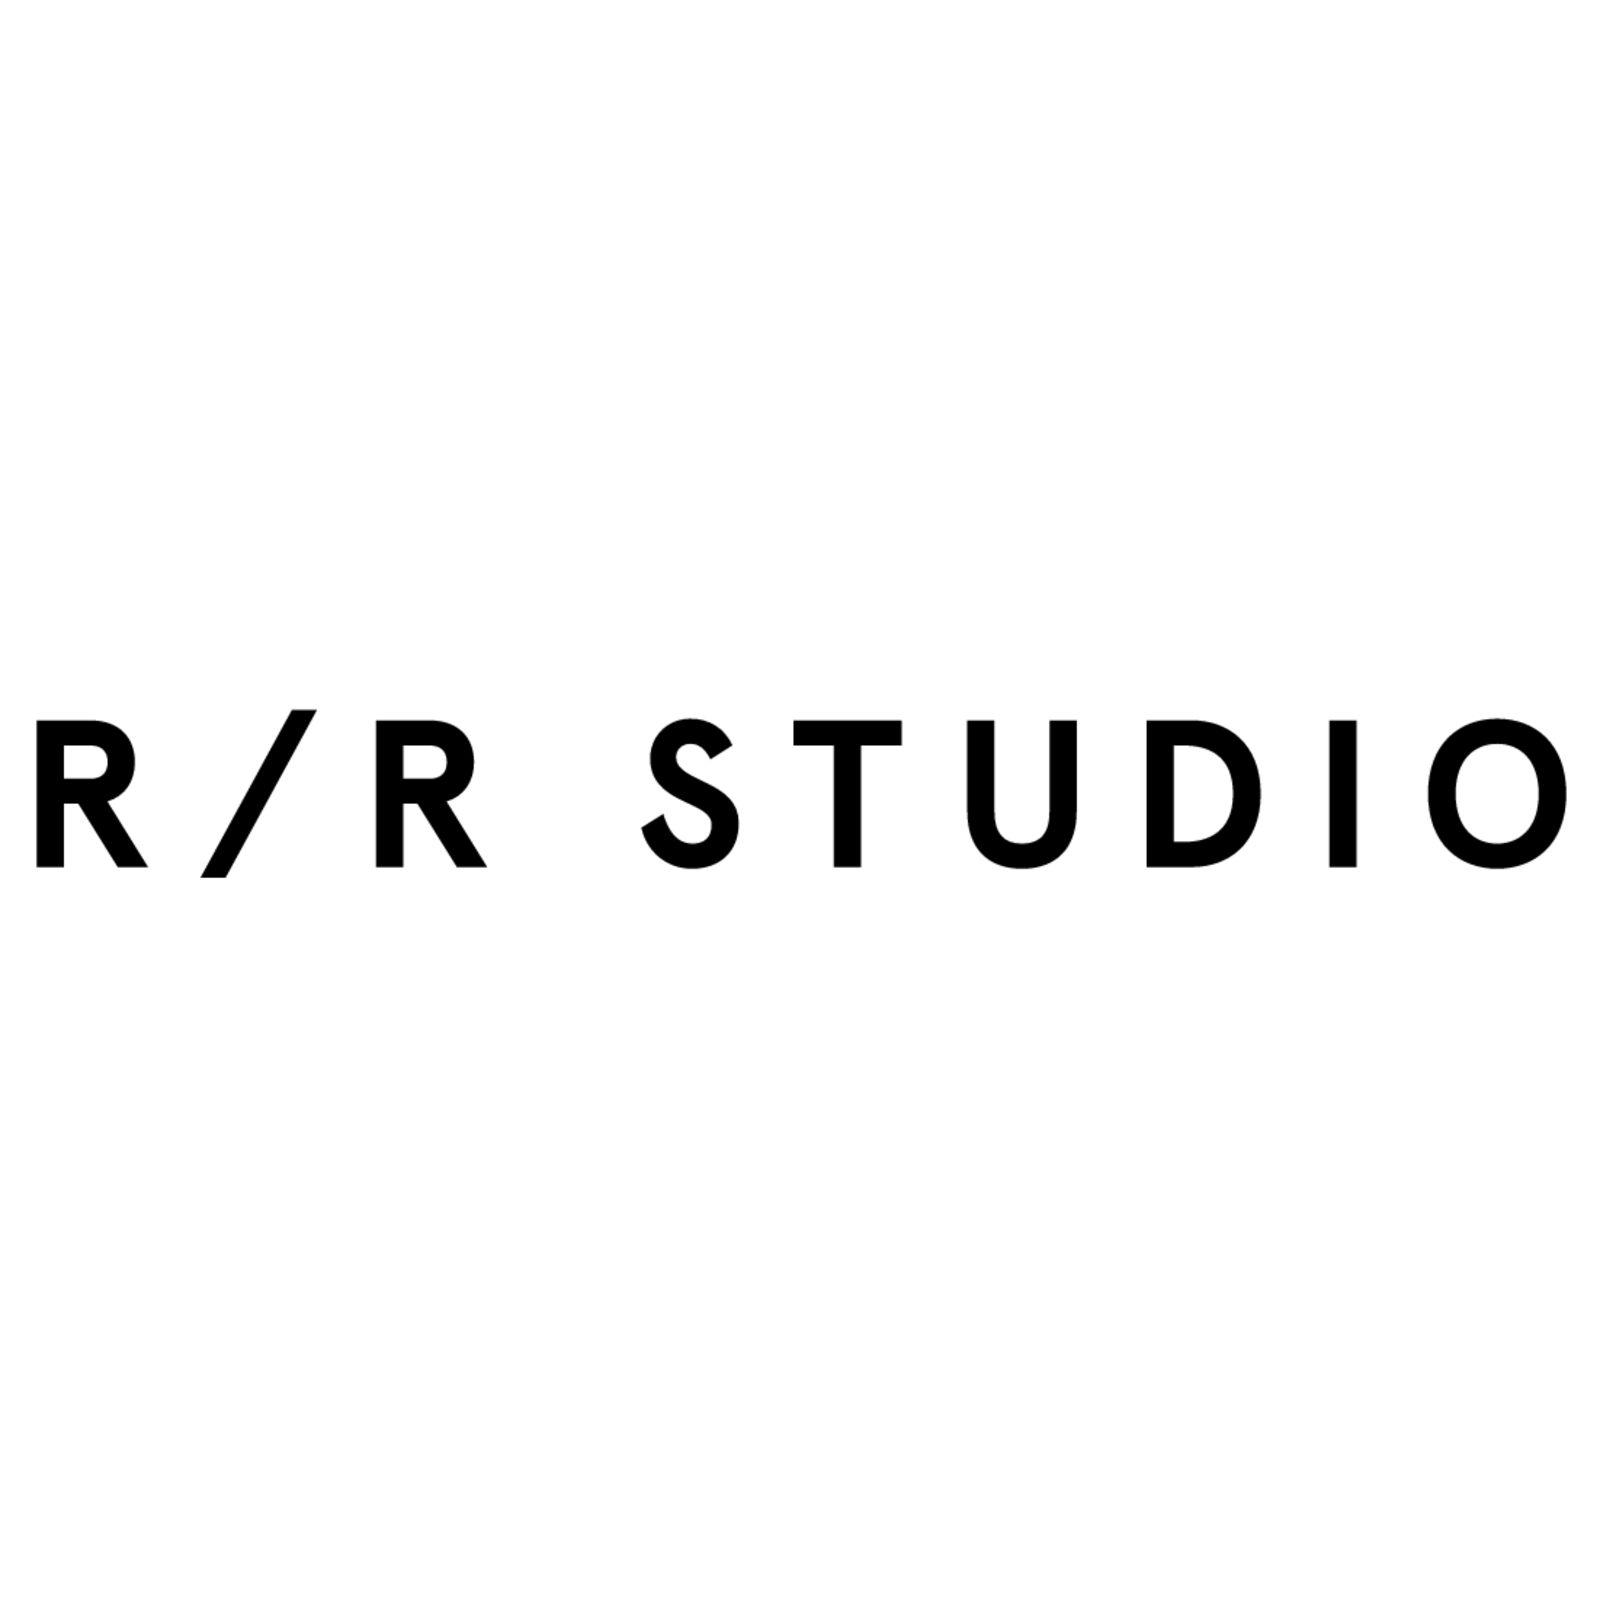 R/R STUDIO